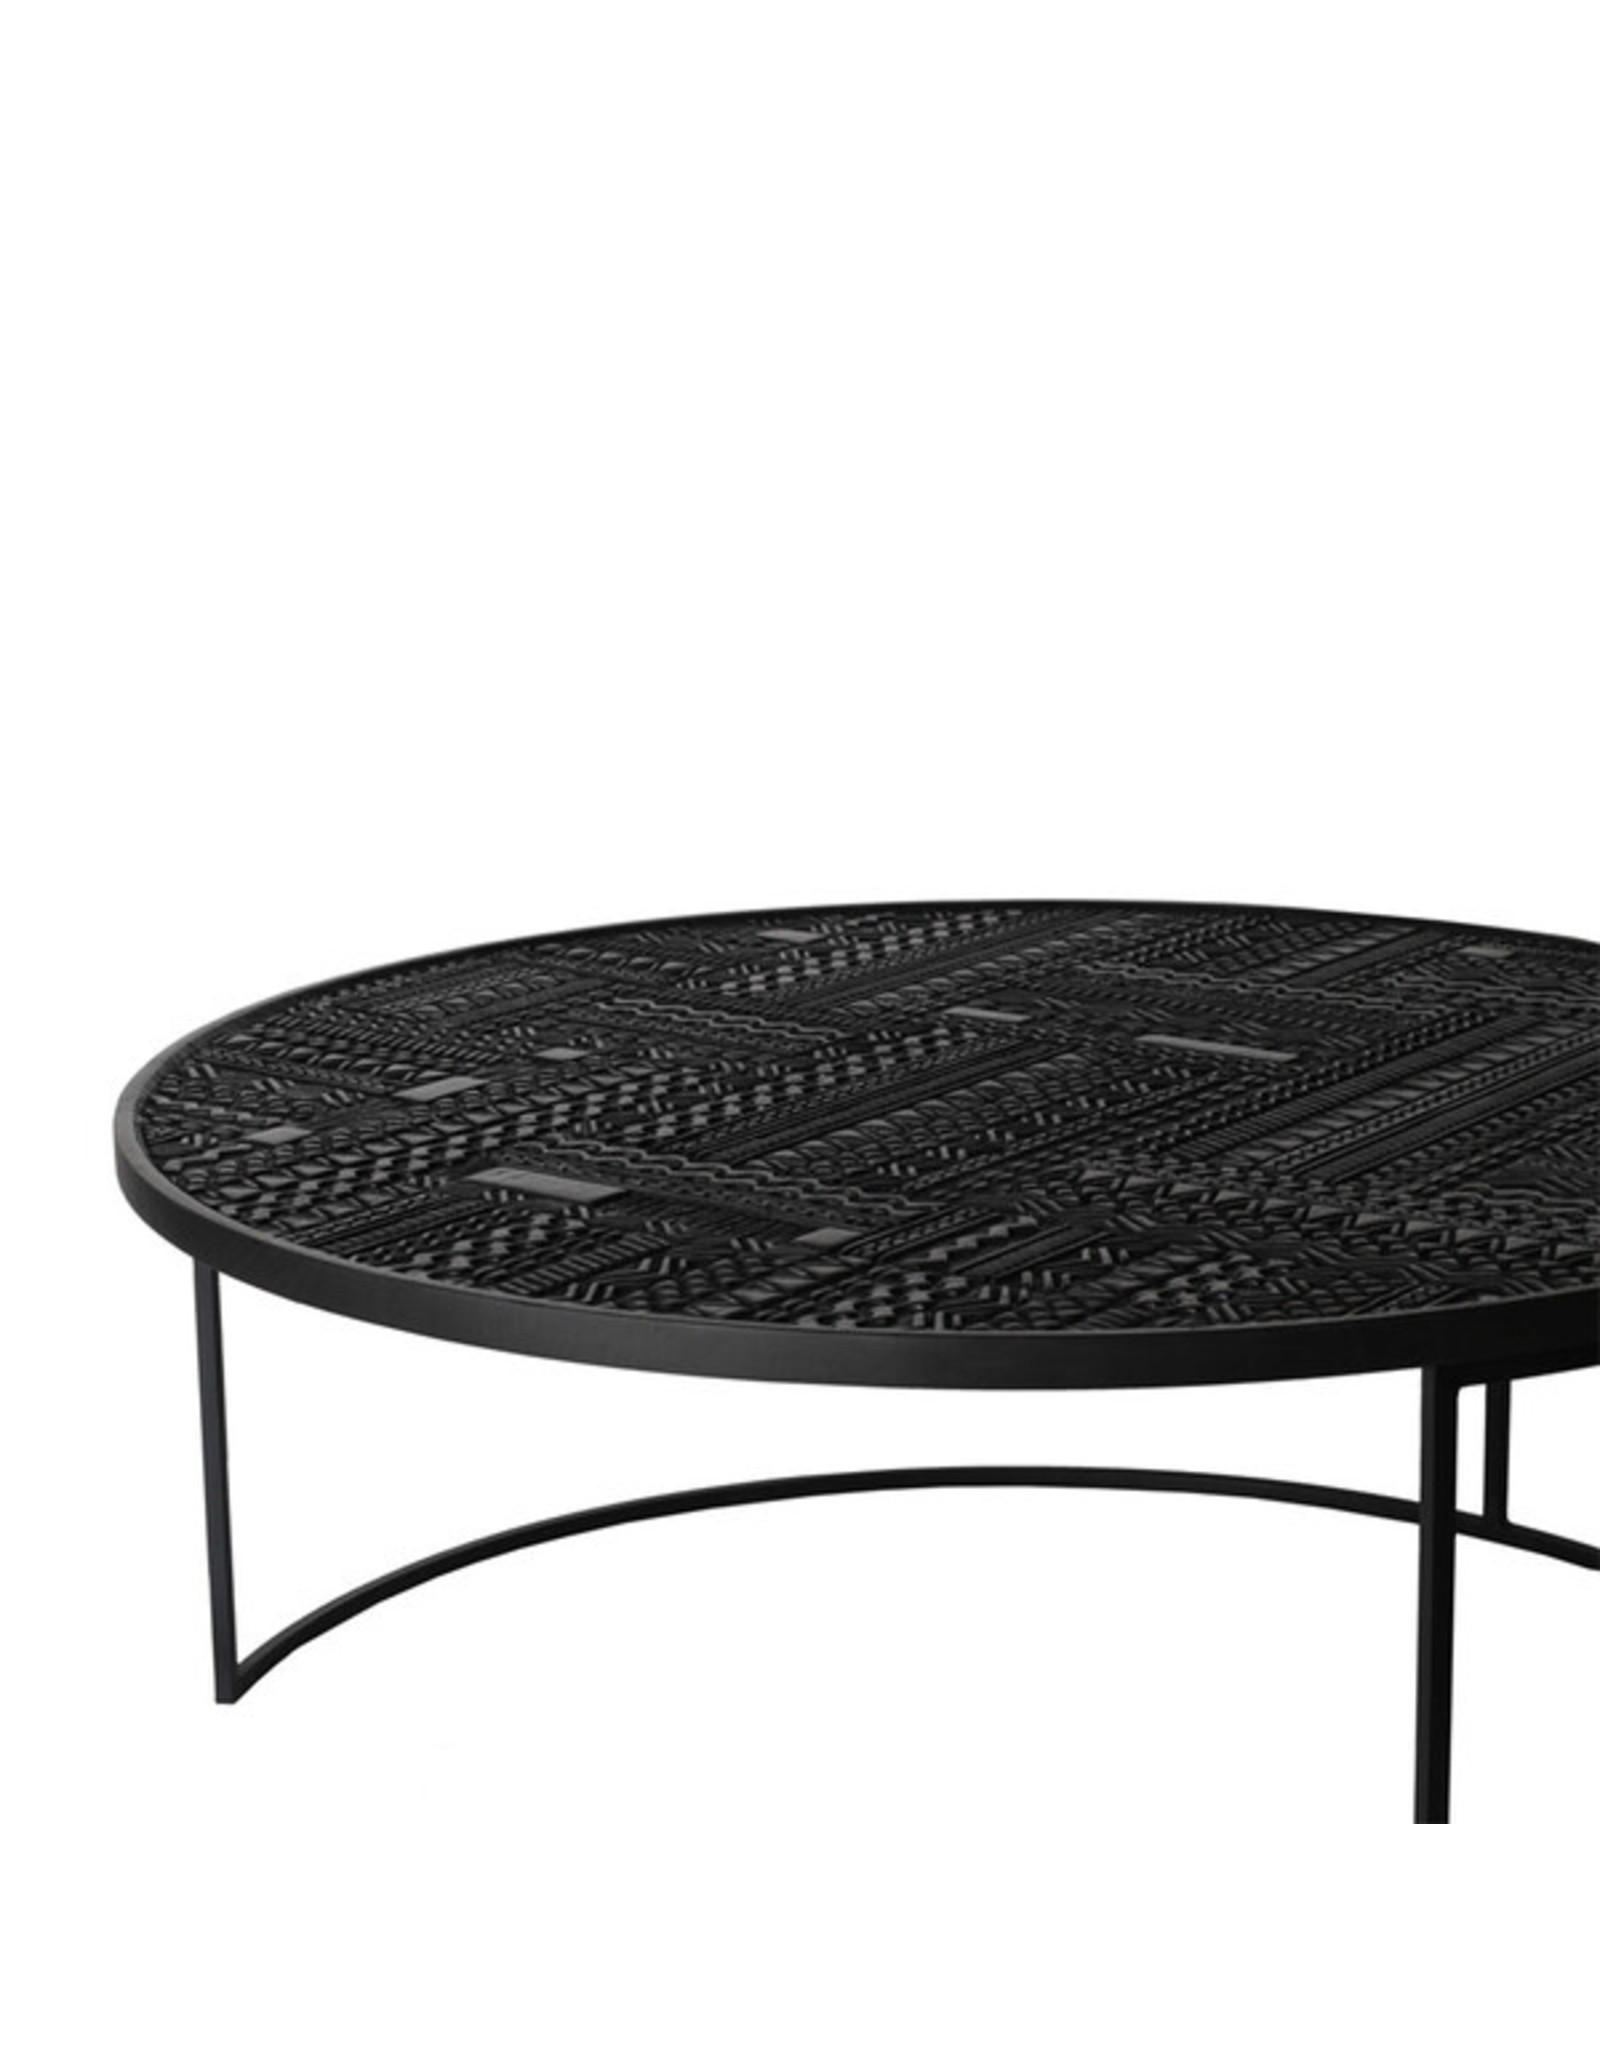 Ethnicraft Teak Tabwa Round Nesting coffee table - set of 3 - Varnished